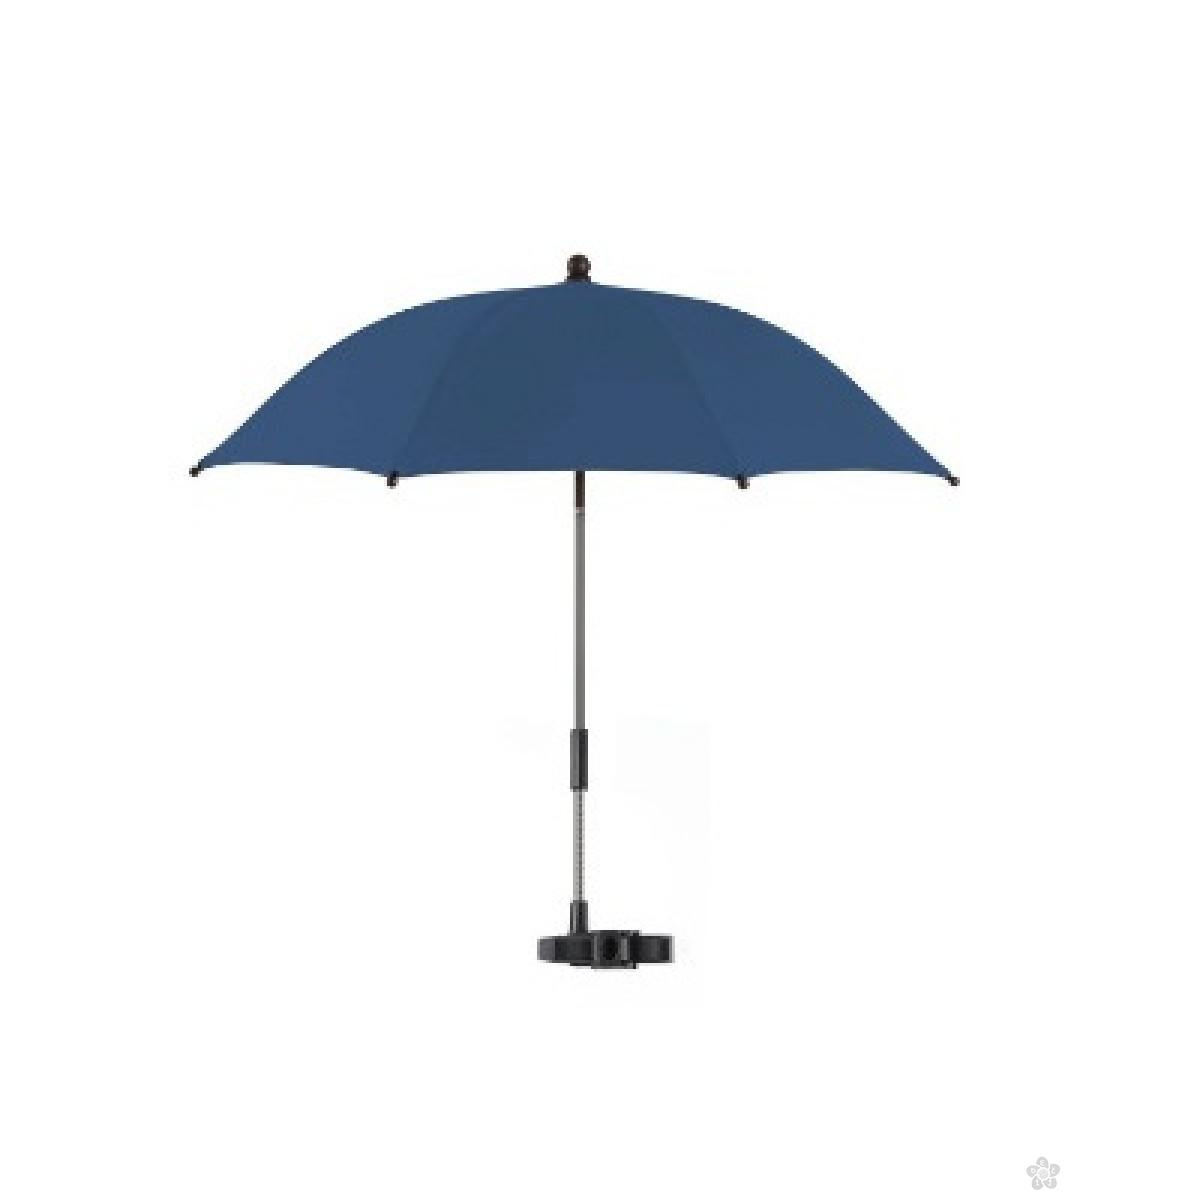 Reer suncobran za kolica sa UV zaštitom, plava, 141-72156